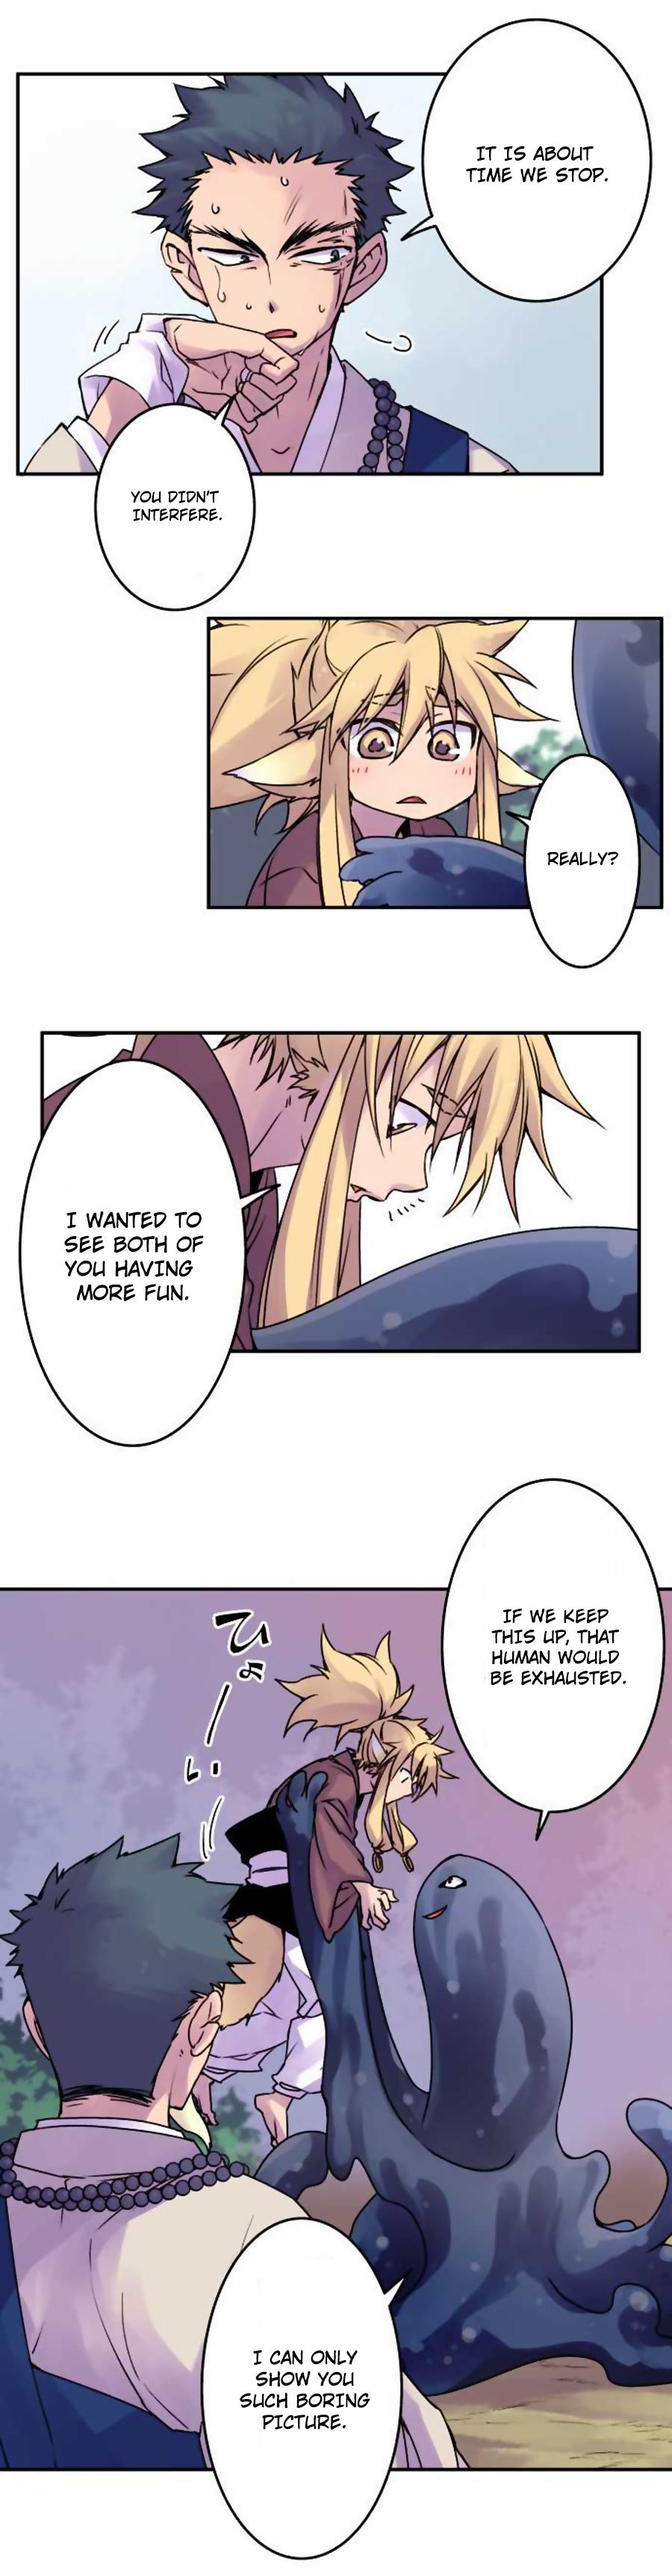 Ake no Tobari - Chapter 46